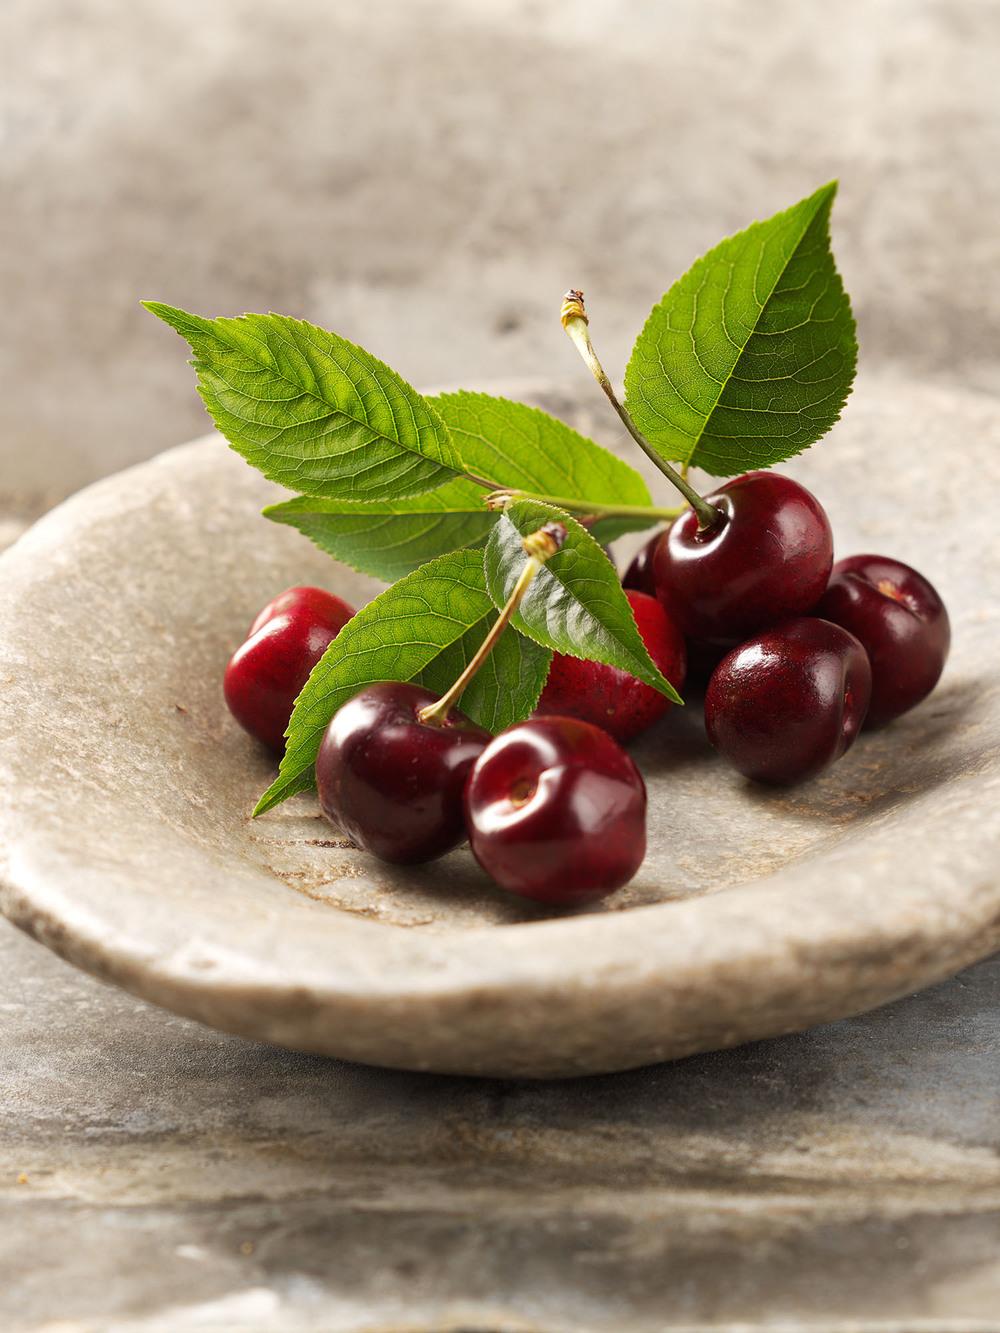 Food Photography Photographer London UK Cherry